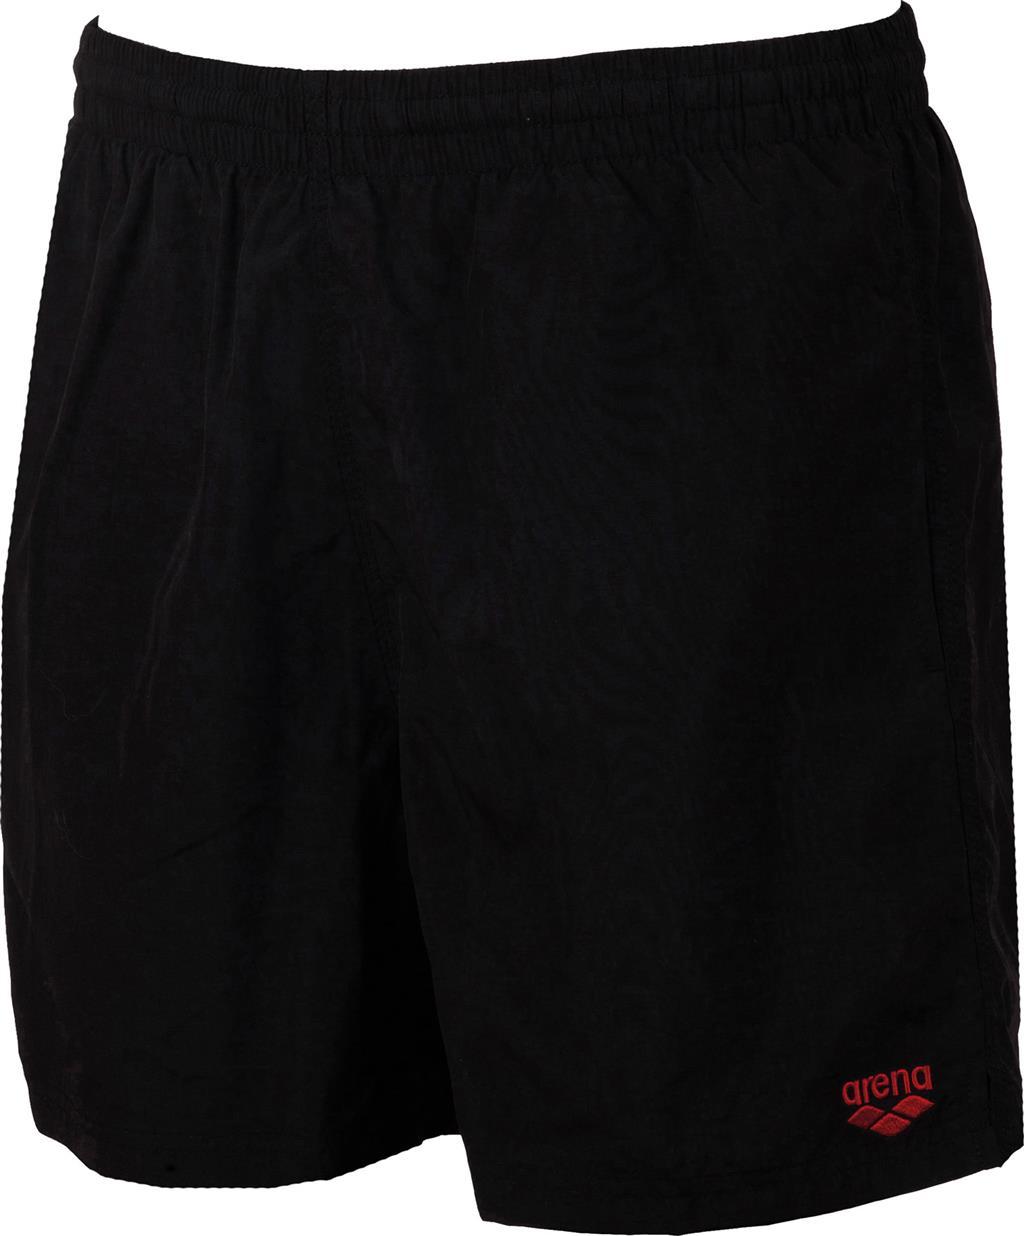 ARENA BADESHORT BOXER    BLACK/SHINY RED